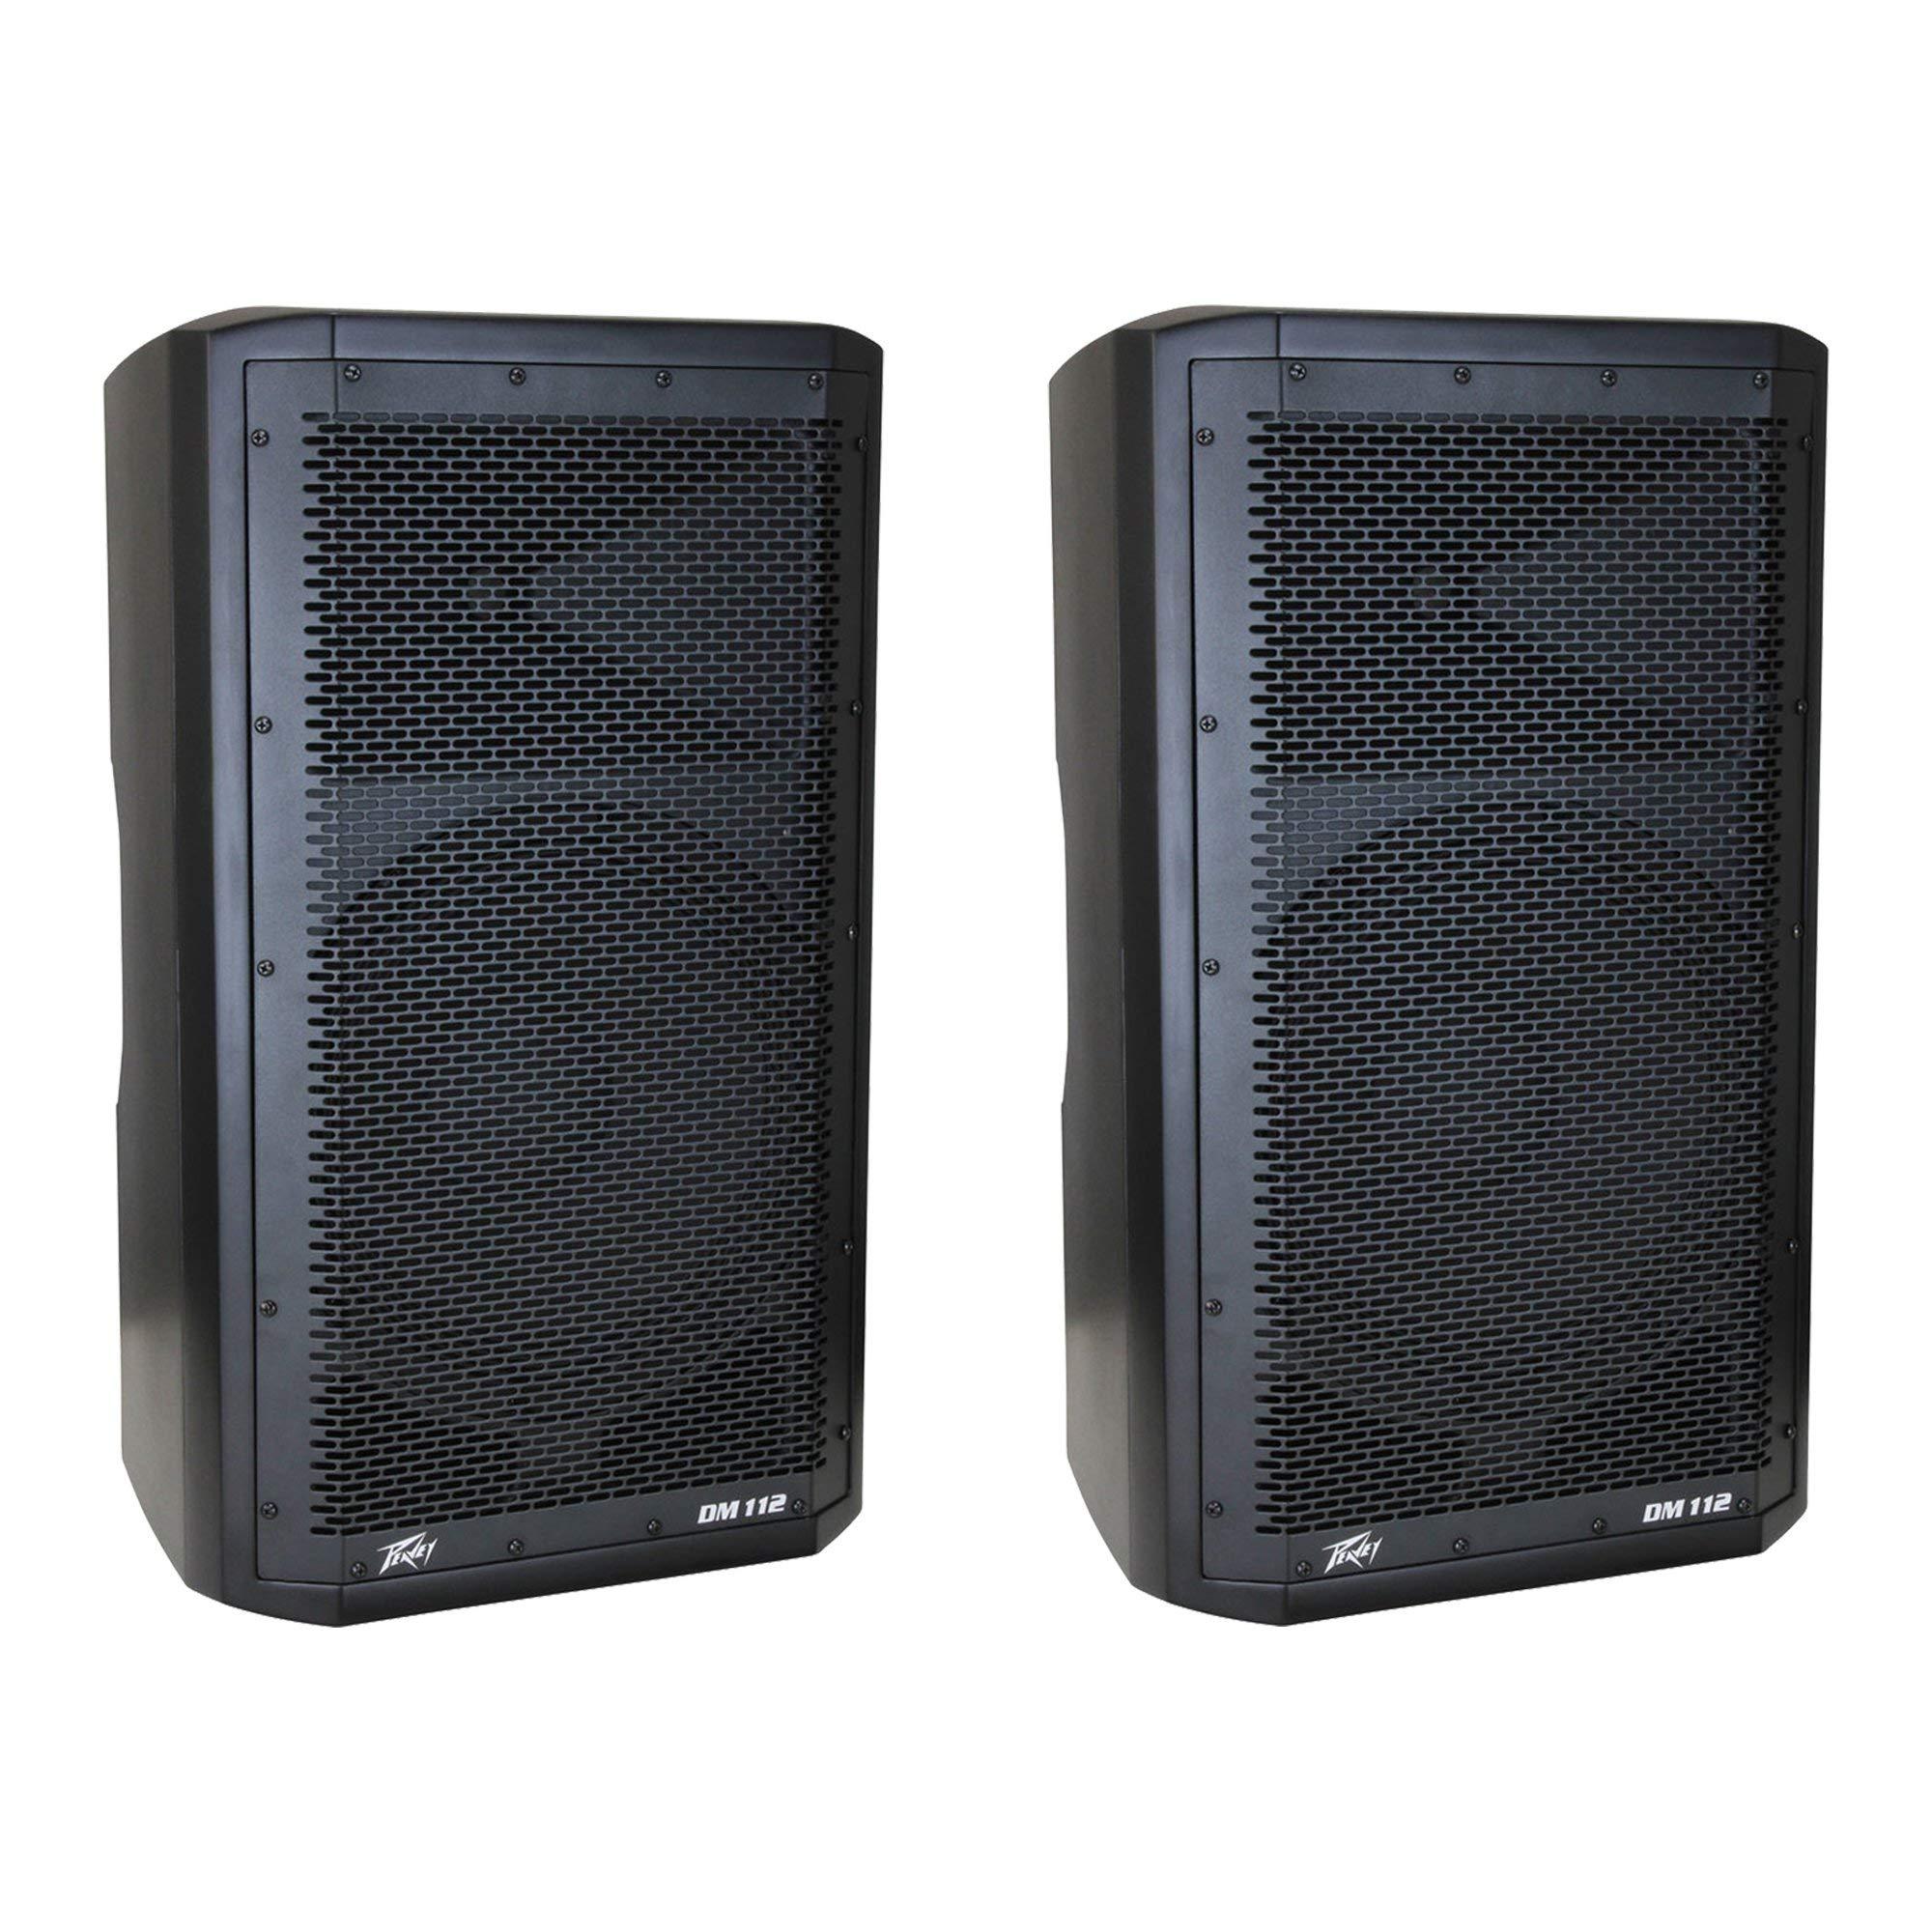 Peavey Dark Matter DM112 Pro DJ 2-Way Active 12 Inch Powered PA Speaker (2 Pack) by Peavey